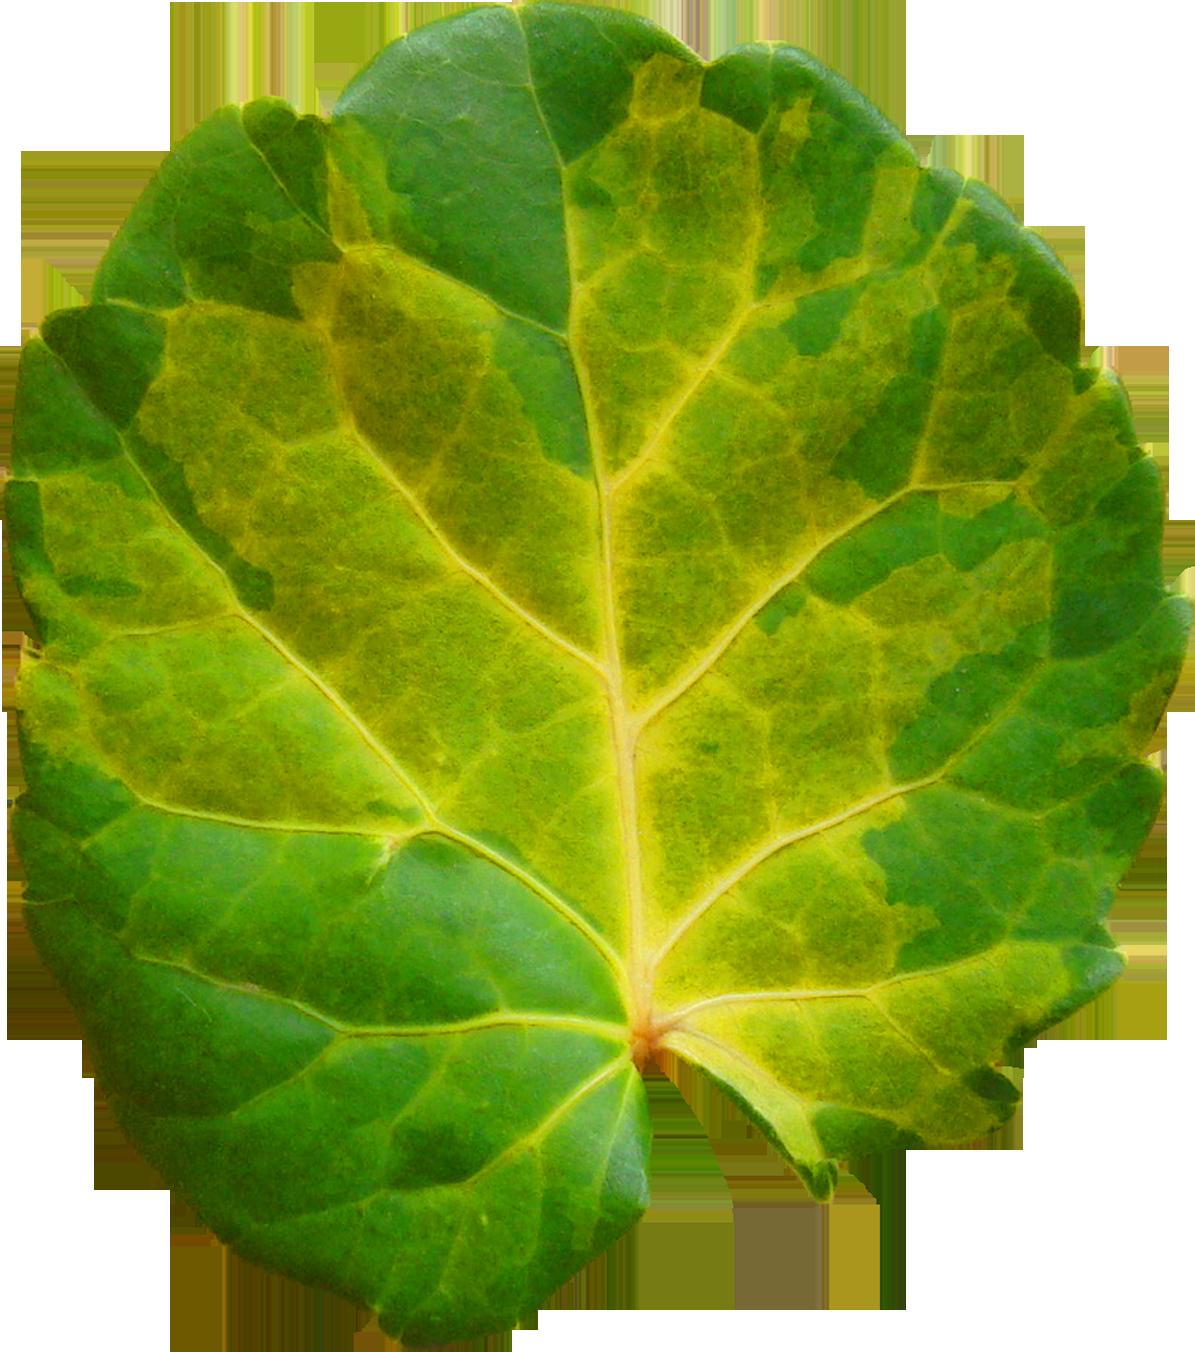 Нарисованный листопад